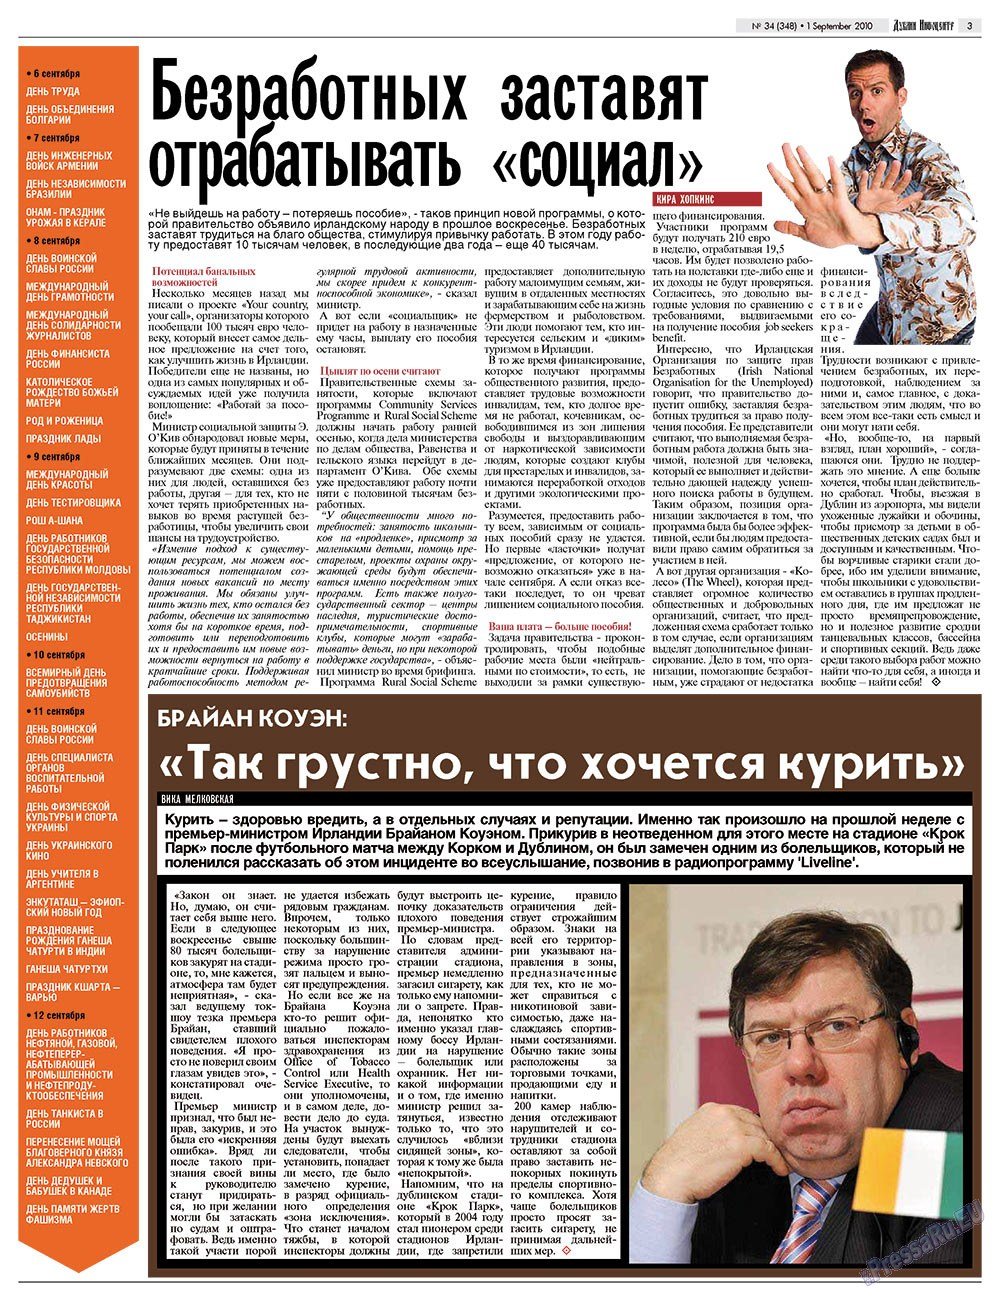 Дублин инфоцентр (газета). 2010 год, номер 34, стр. 3